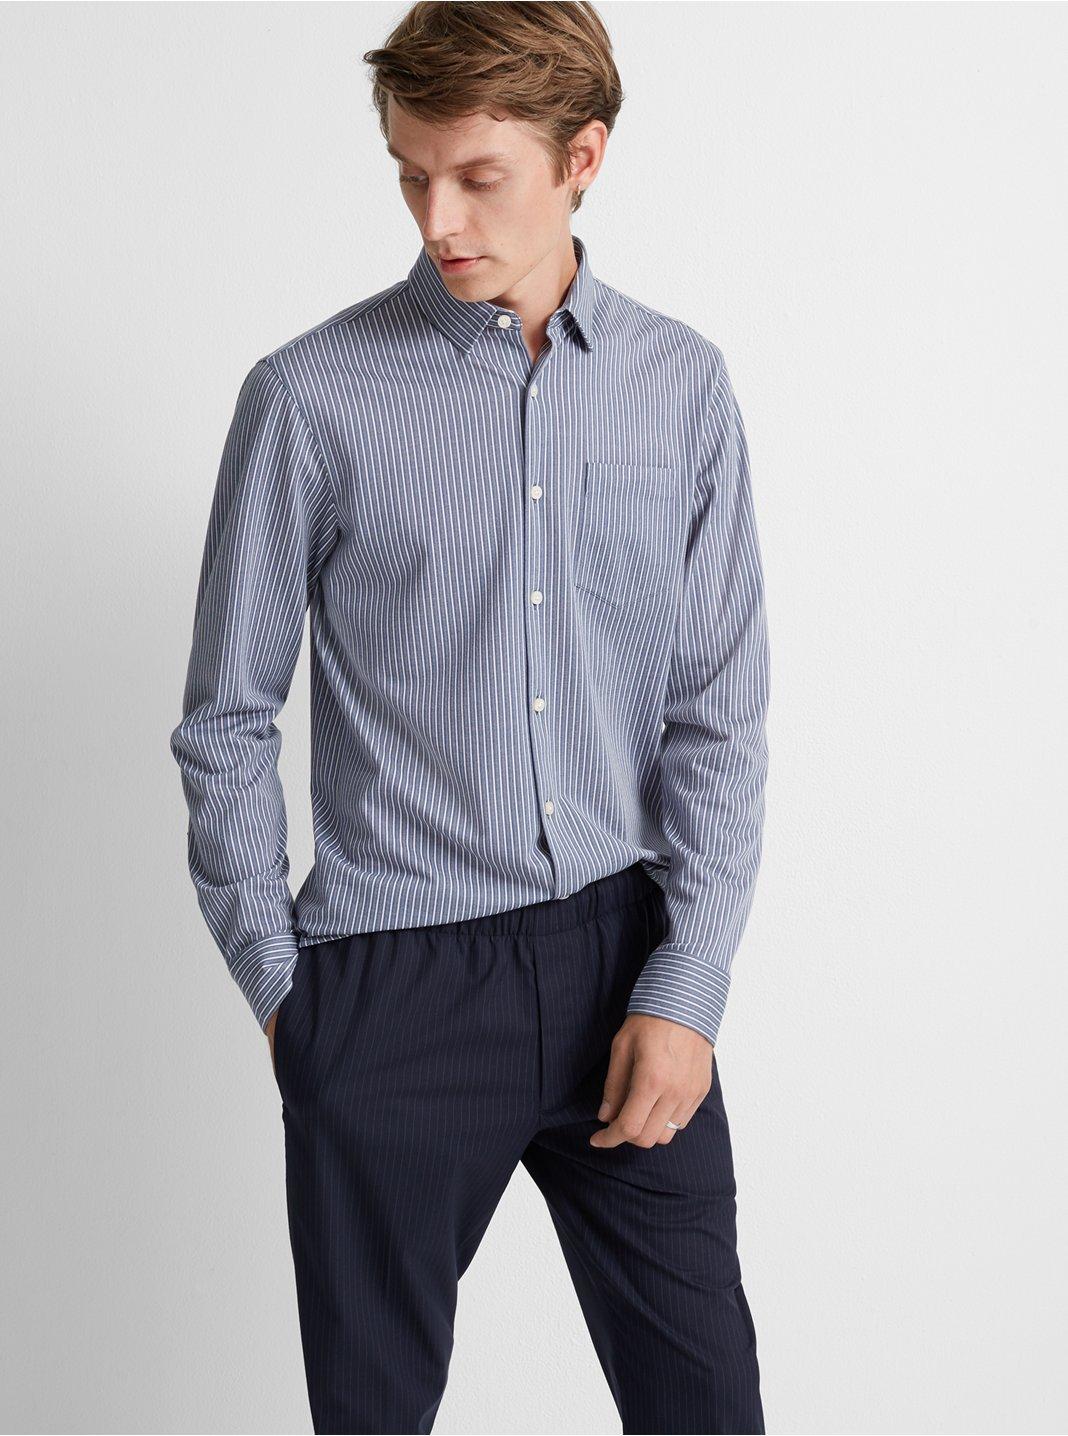 Full-Button Knit Stripe Shirt